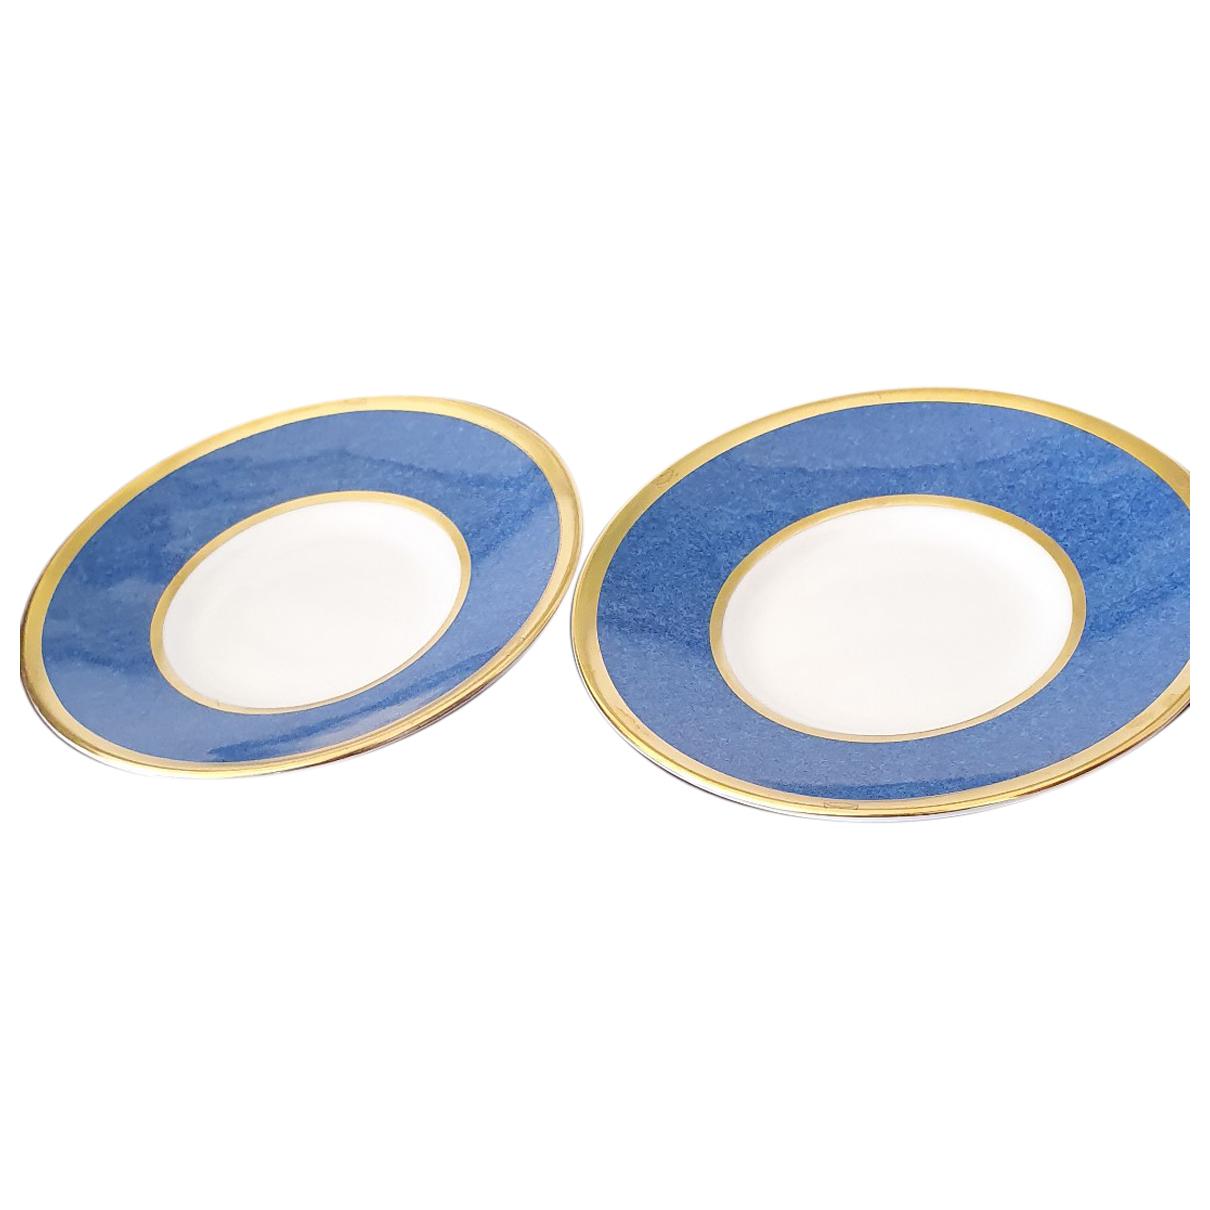 Cartier \N Tischkultur in  Blau Porzellan